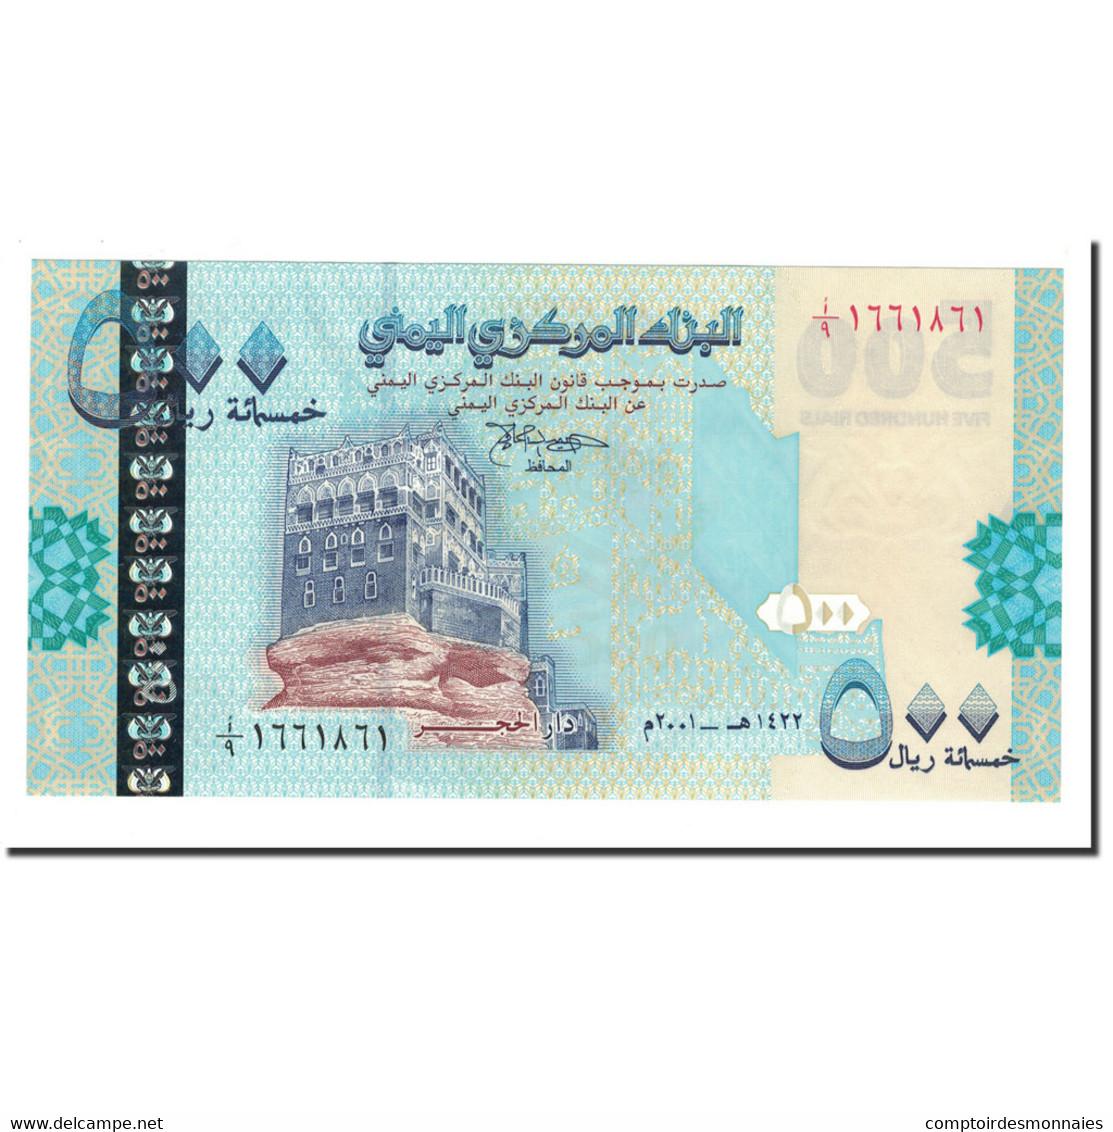 Yemen Arab Republic, 500 Rials, 2001, KM:31, NEUF - Yémen